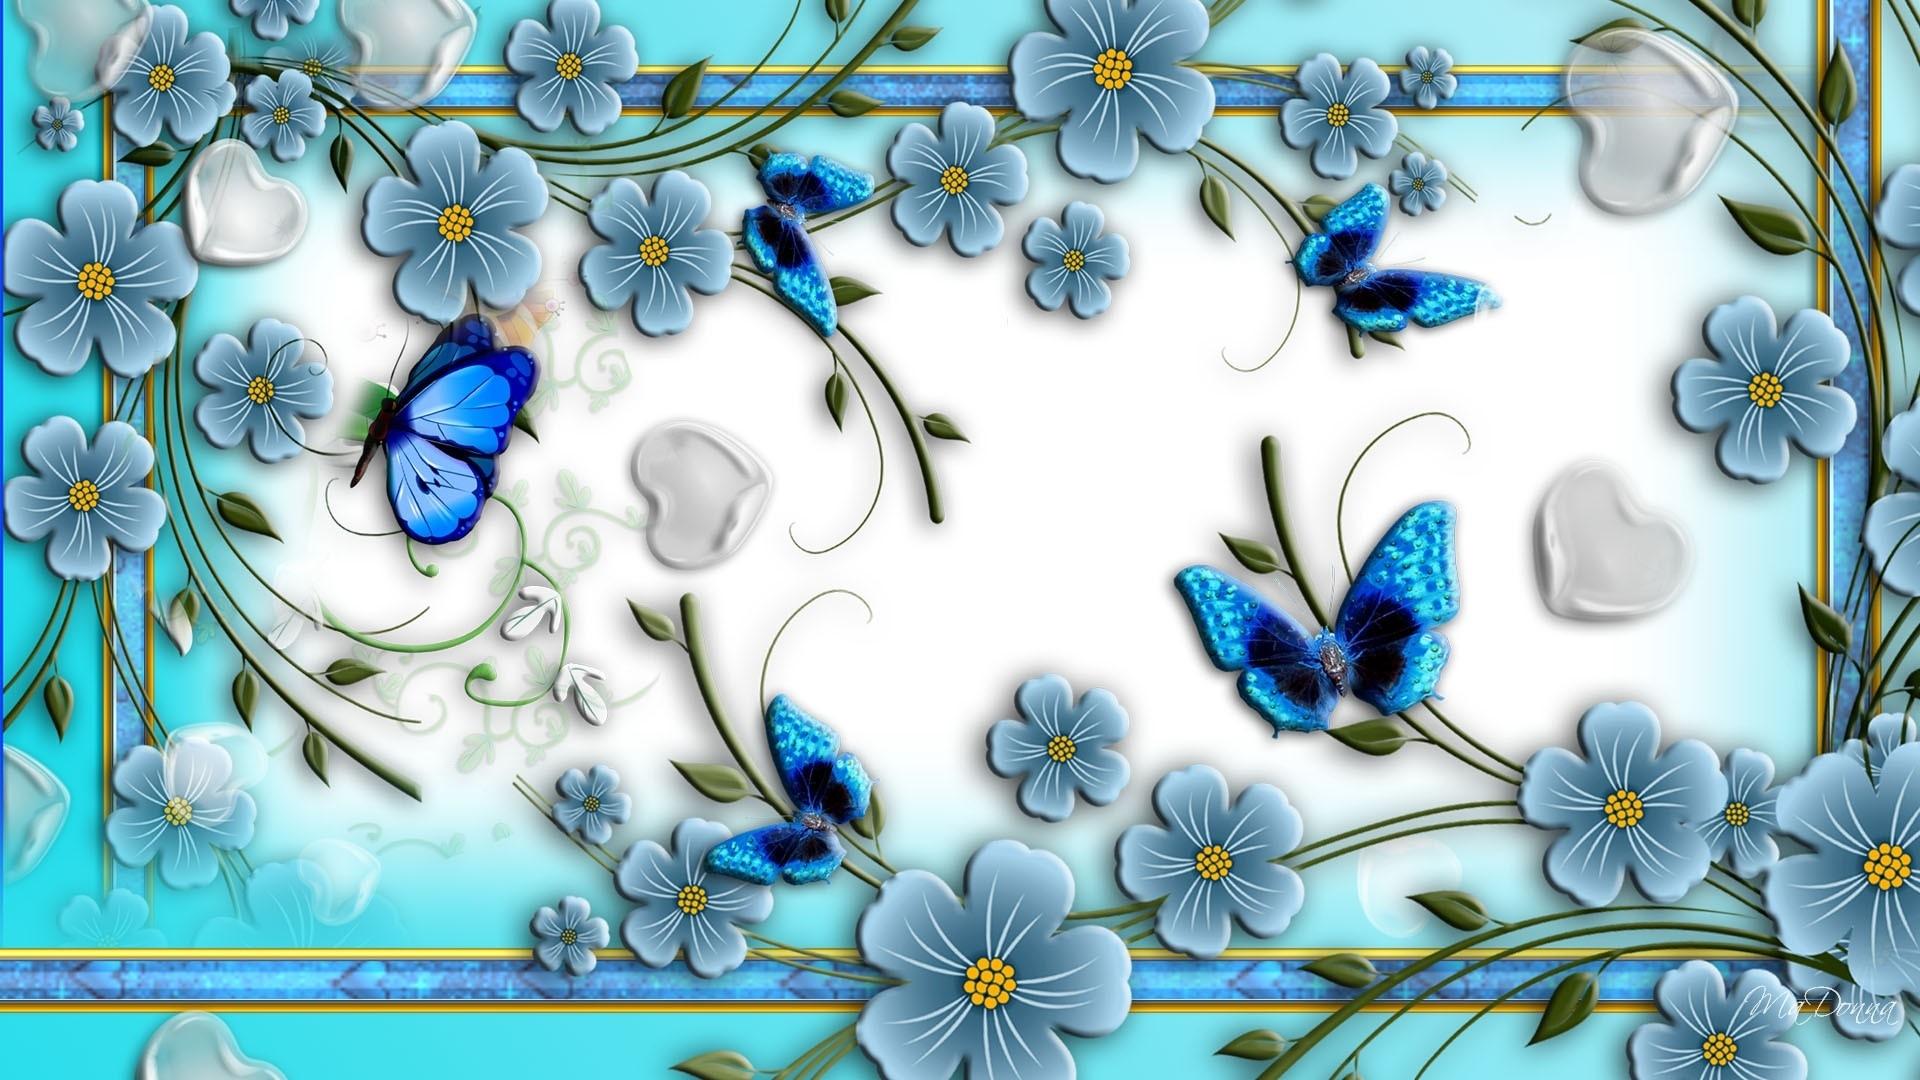 abstract flower hd deskto